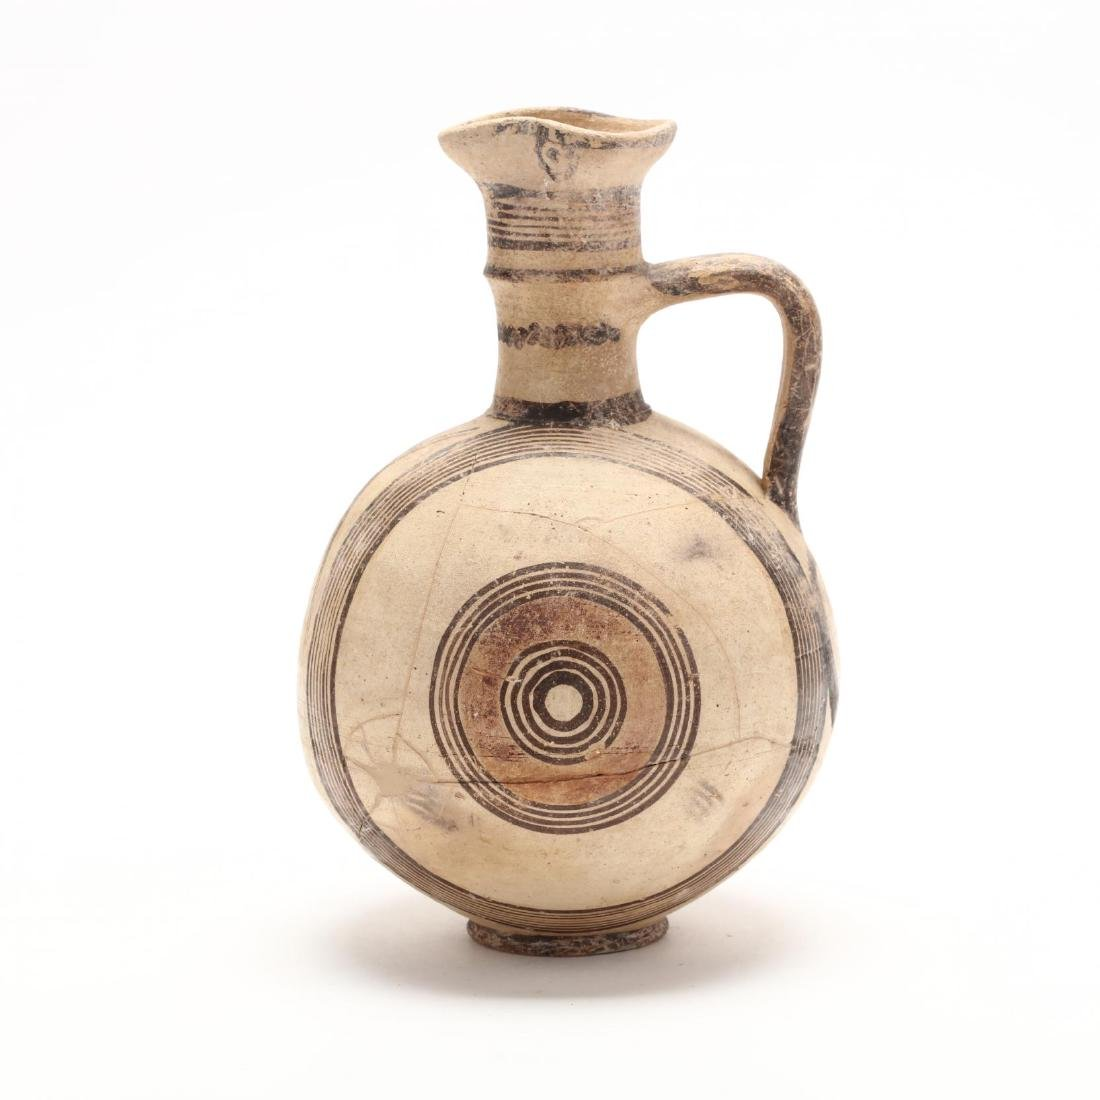 Cyprio-Archaic Barrel Form Bichrome Pitcher - 3